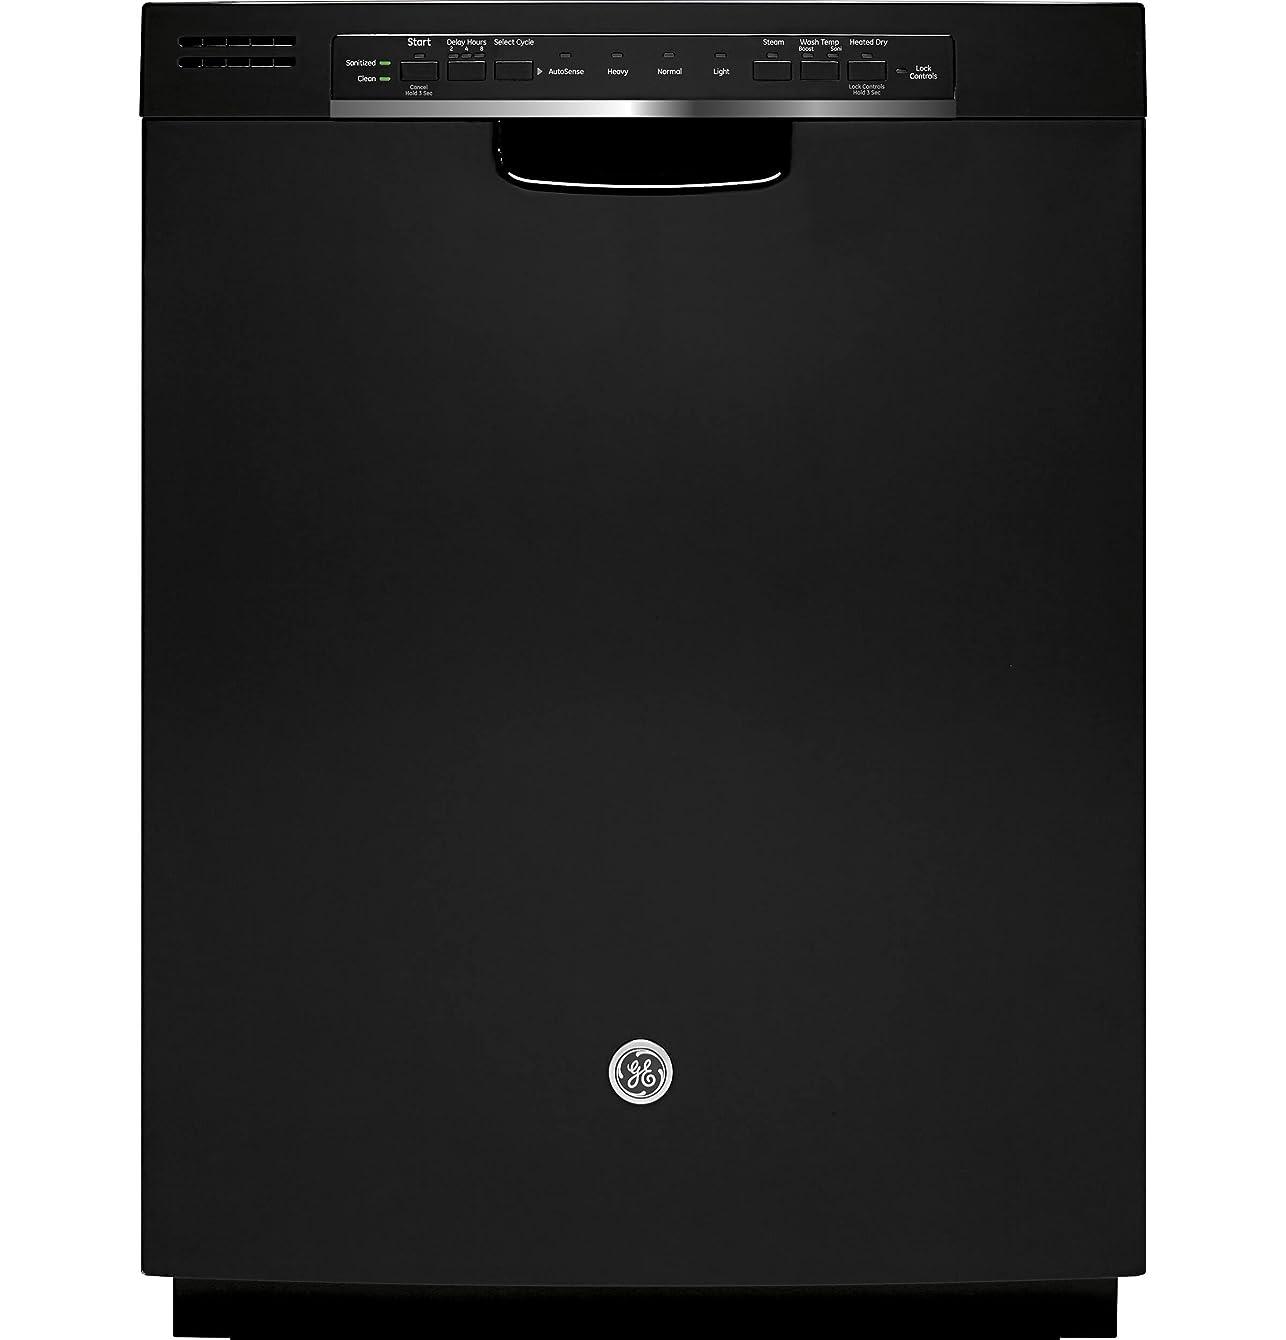 GE GDF570SGJBB Built In Dishwasher